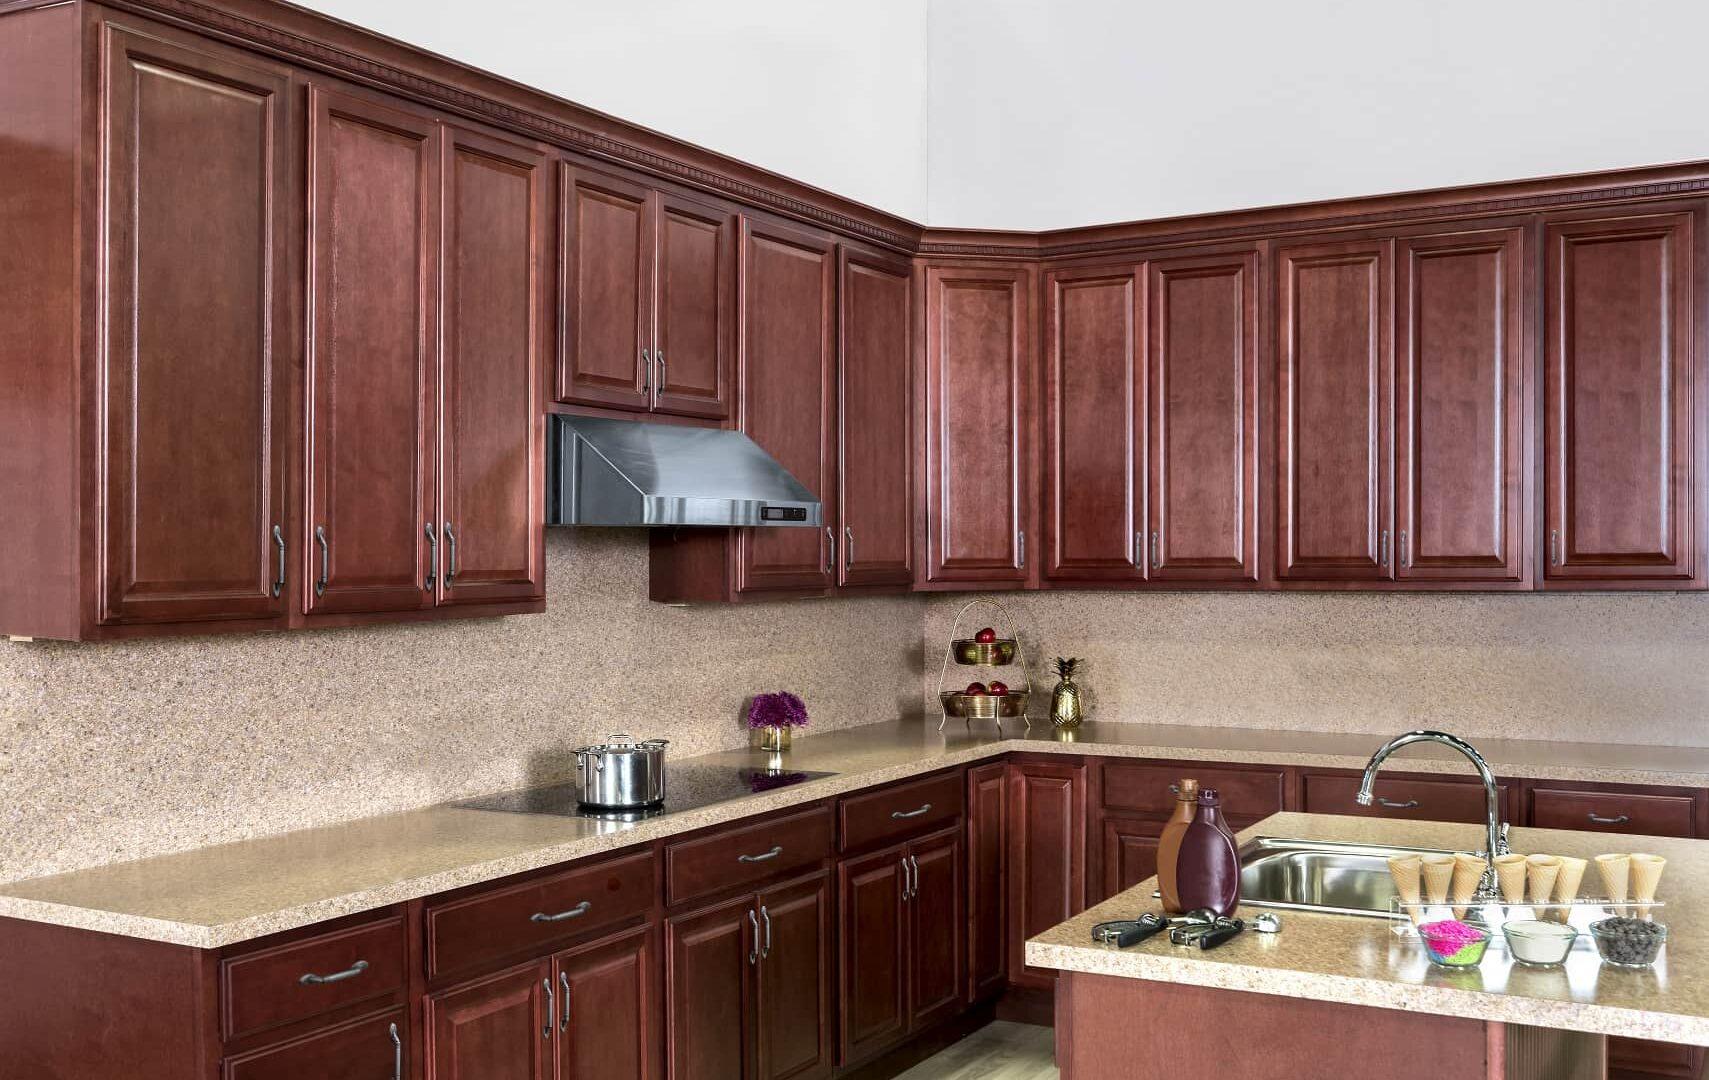 Kitchen Design, Kitchen Design Models, Kitchen Design Ideas, Industrial, Cottage, Inspiration, Simple, Tiles, Big, Elegant, DIY